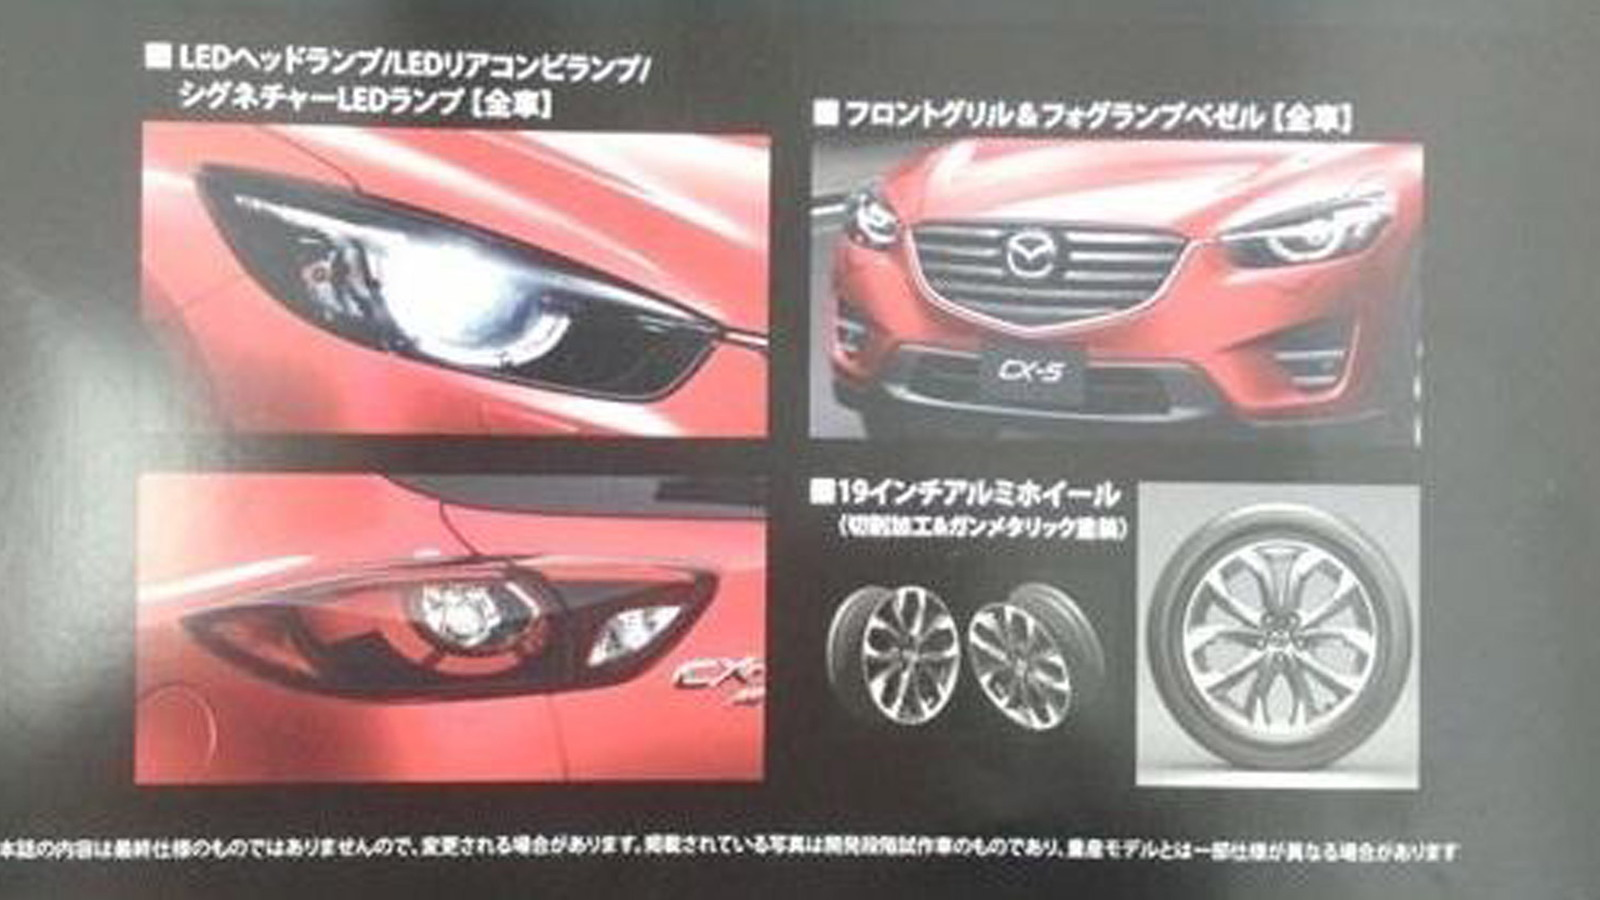 2016 Mazda CX-5 leaked via brochure scans (Image via Worldscoop forums)